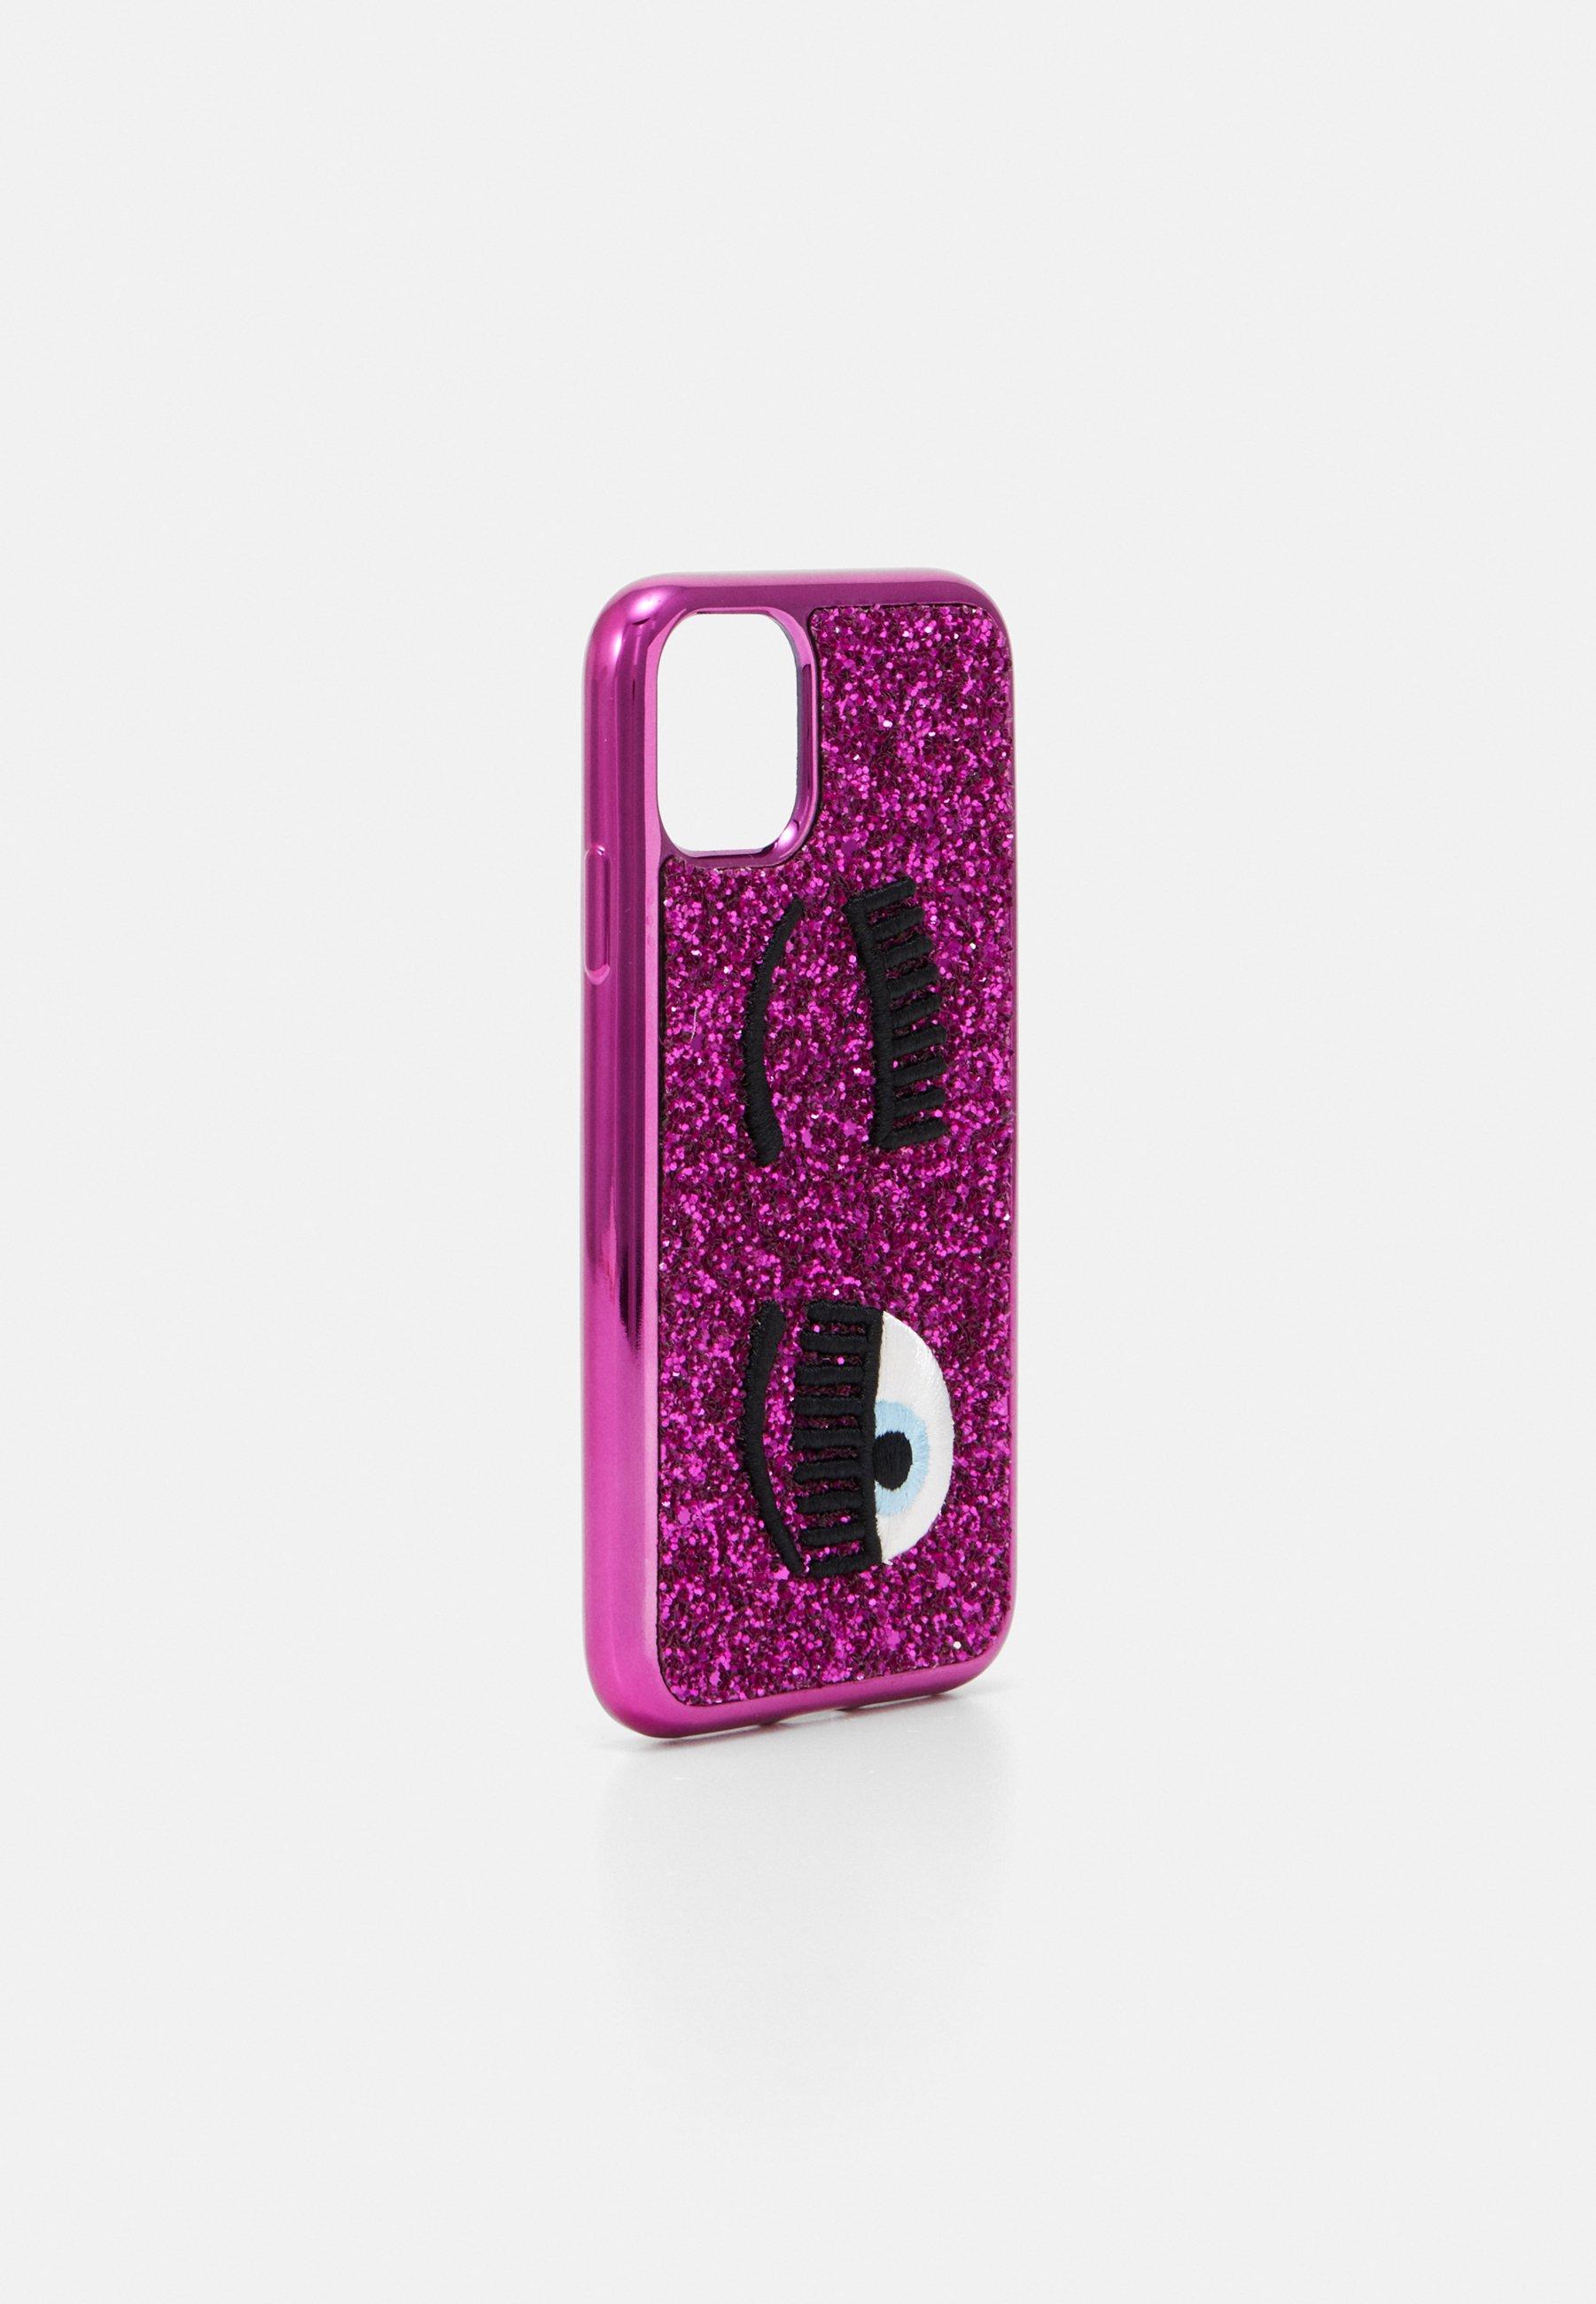 CHIARA FERRAGNI GLITTER FLIRTING CASE IPHONE 11 - Mobilveske - fuxia/rosa th5iNiTevVOb5AD